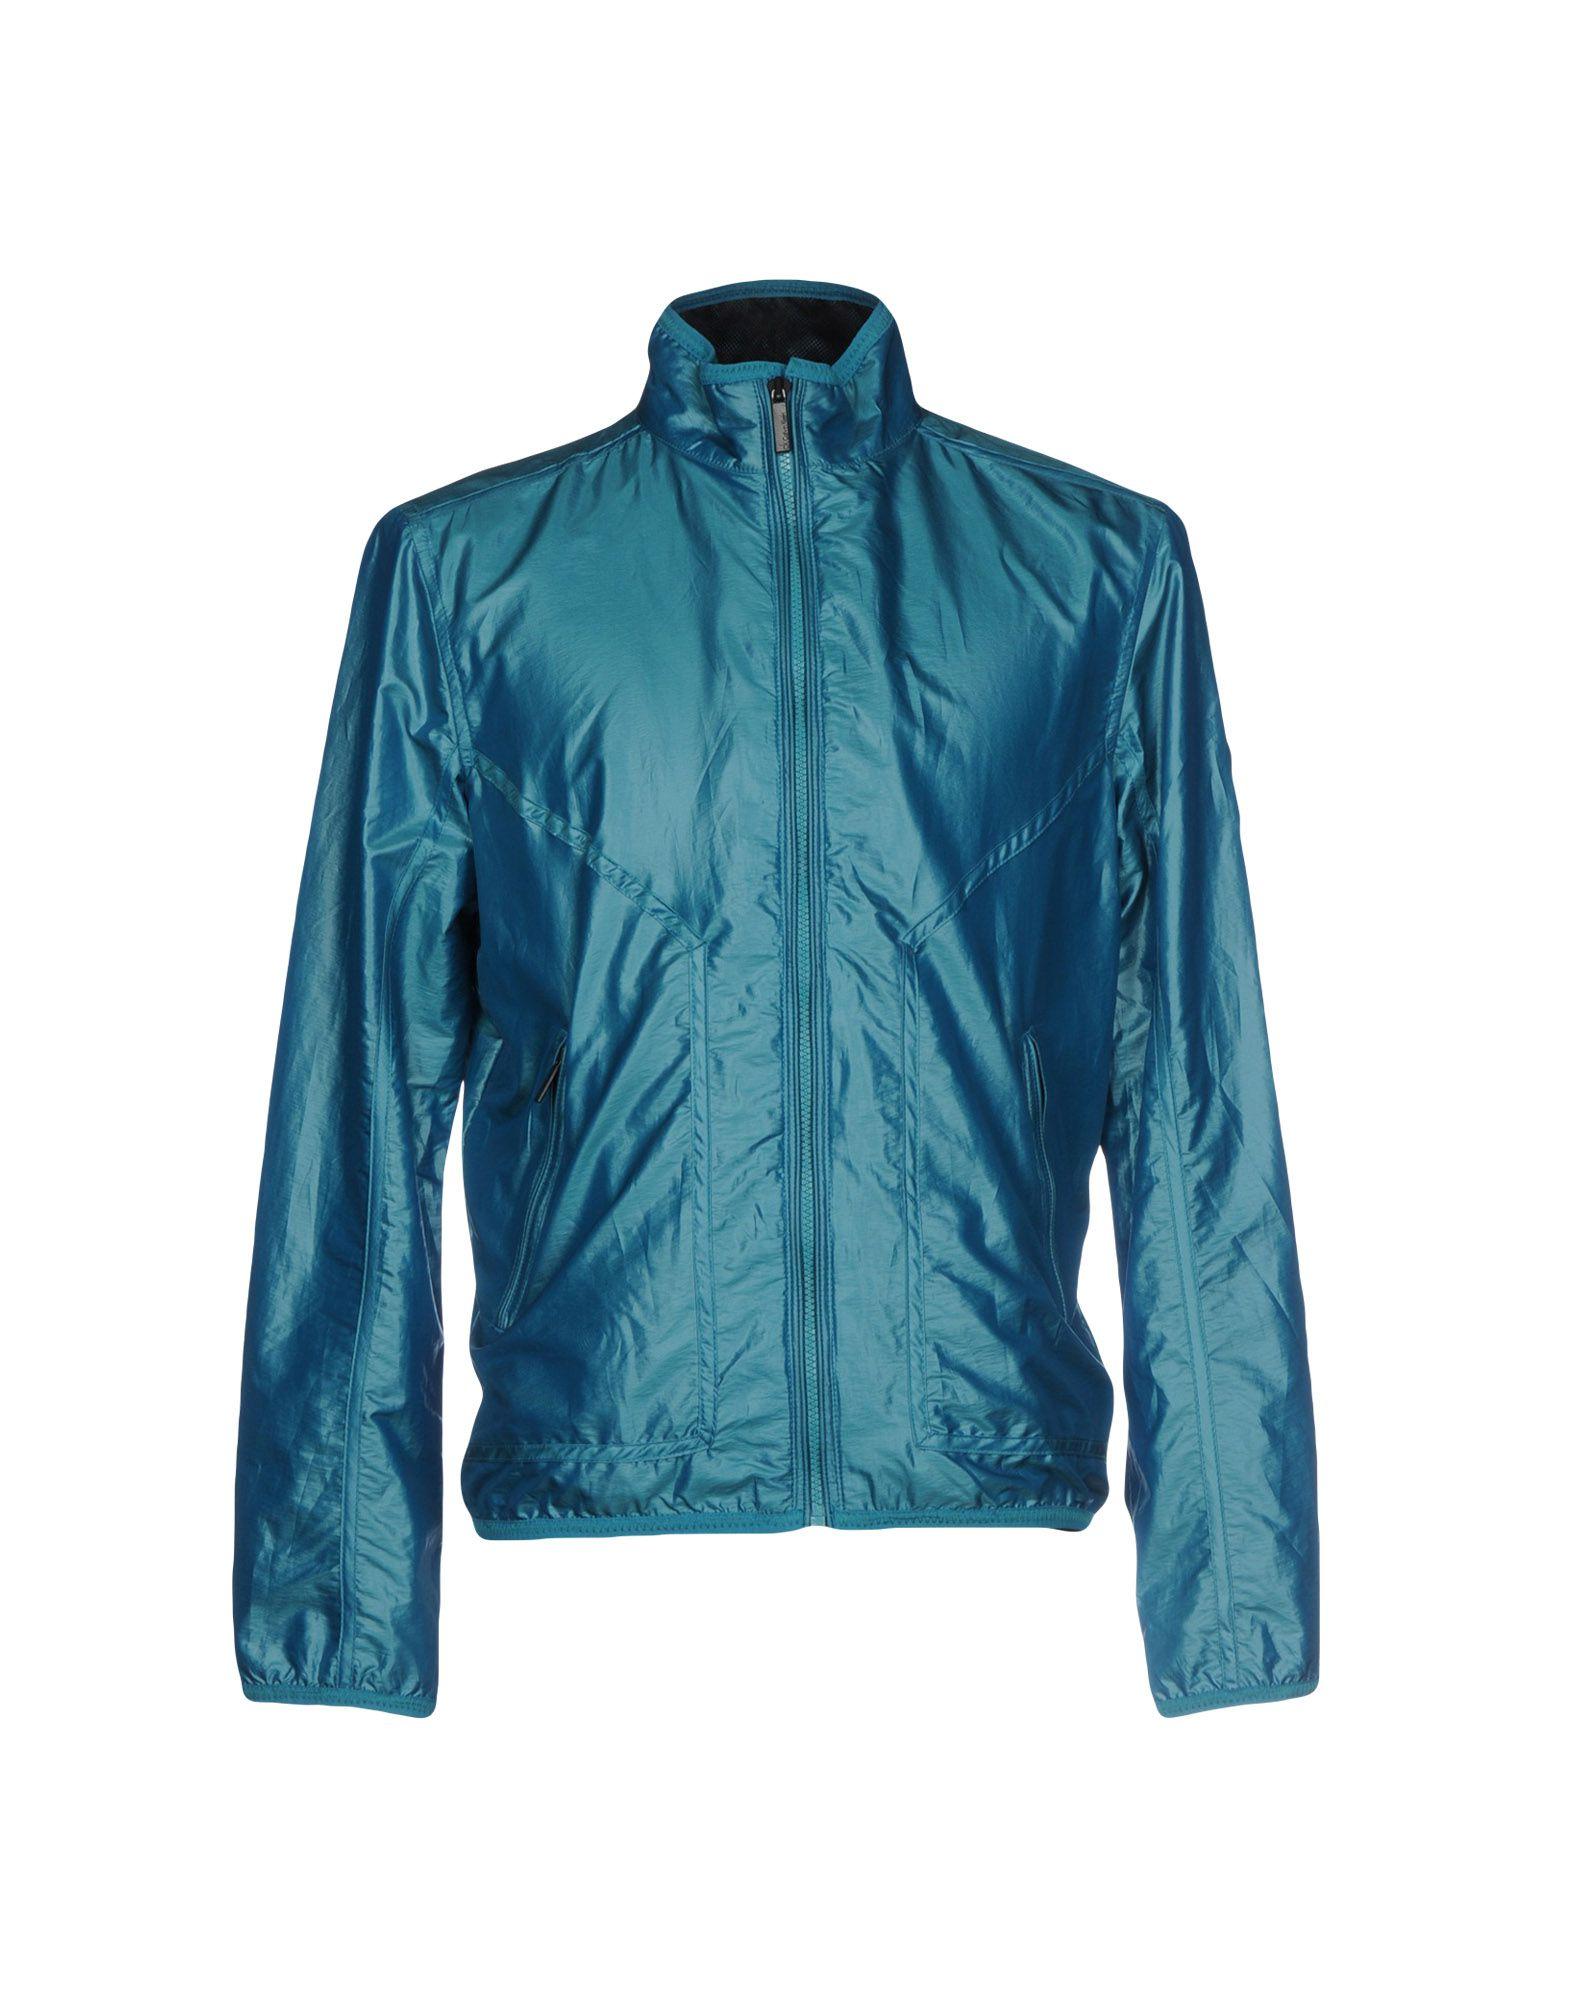 CK CALVIN KLEIN Куртка куртка fine 219 9285 aj ck ea7